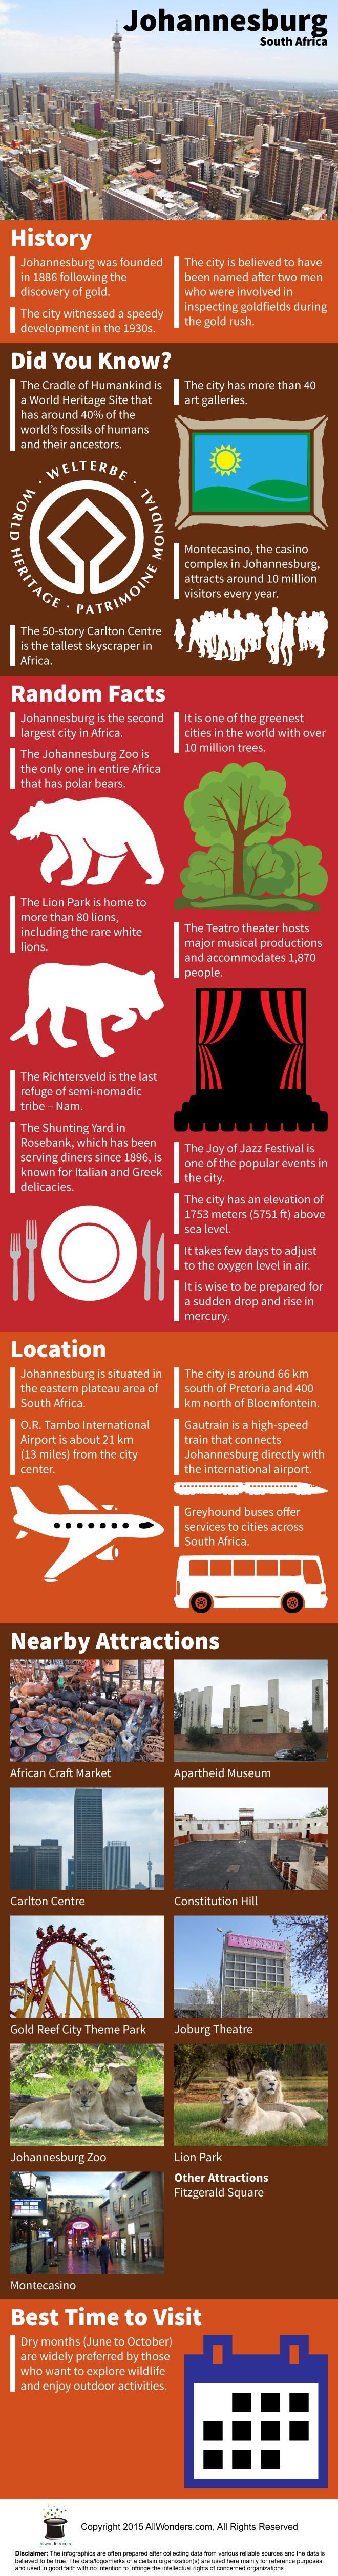 Johannesburg Infographic